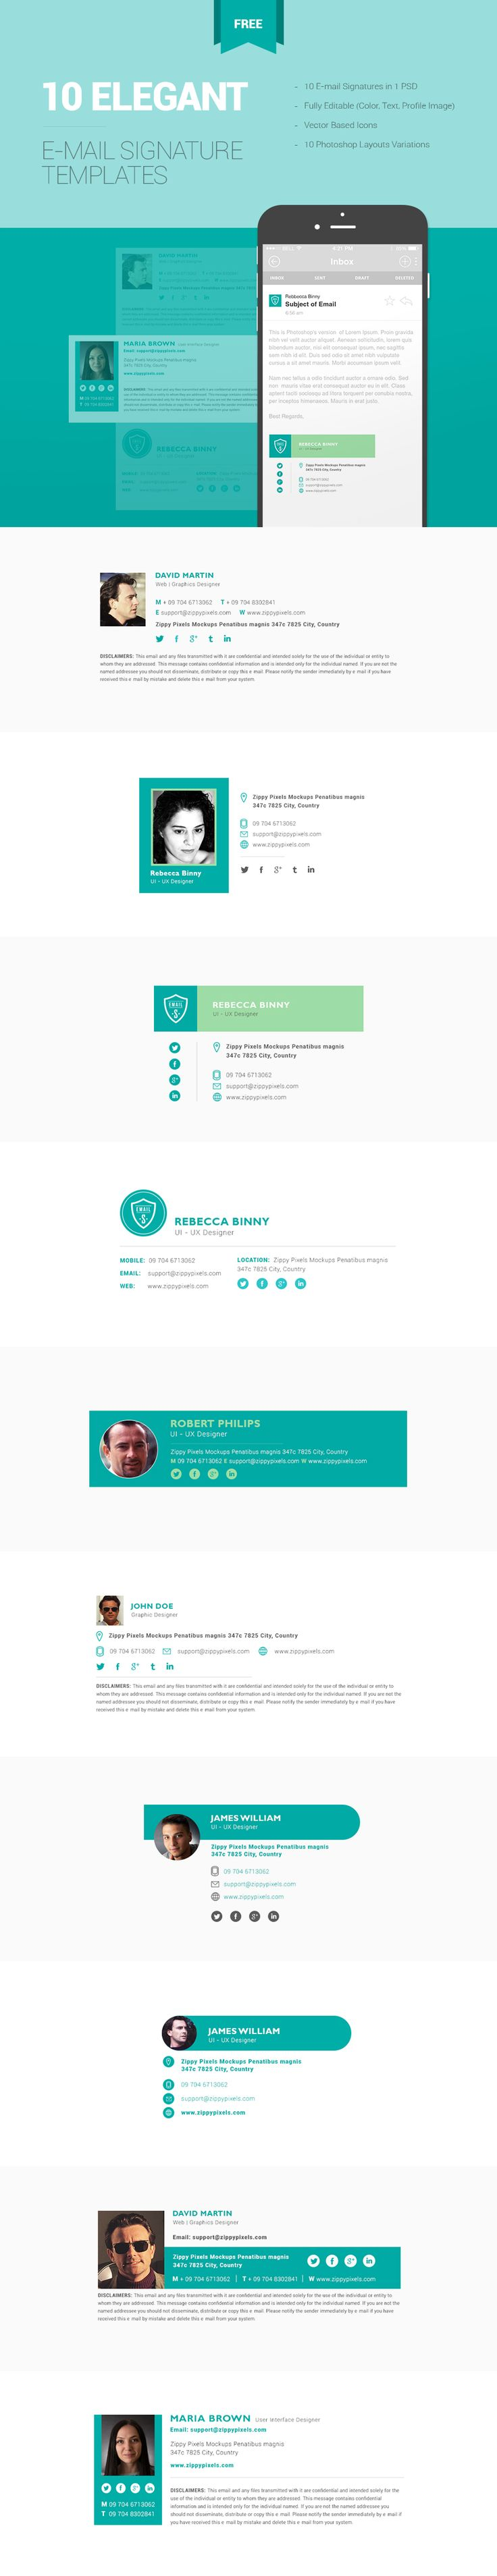 10 Plantillas PSD gratis para crear firmas de correo electrónico creativas